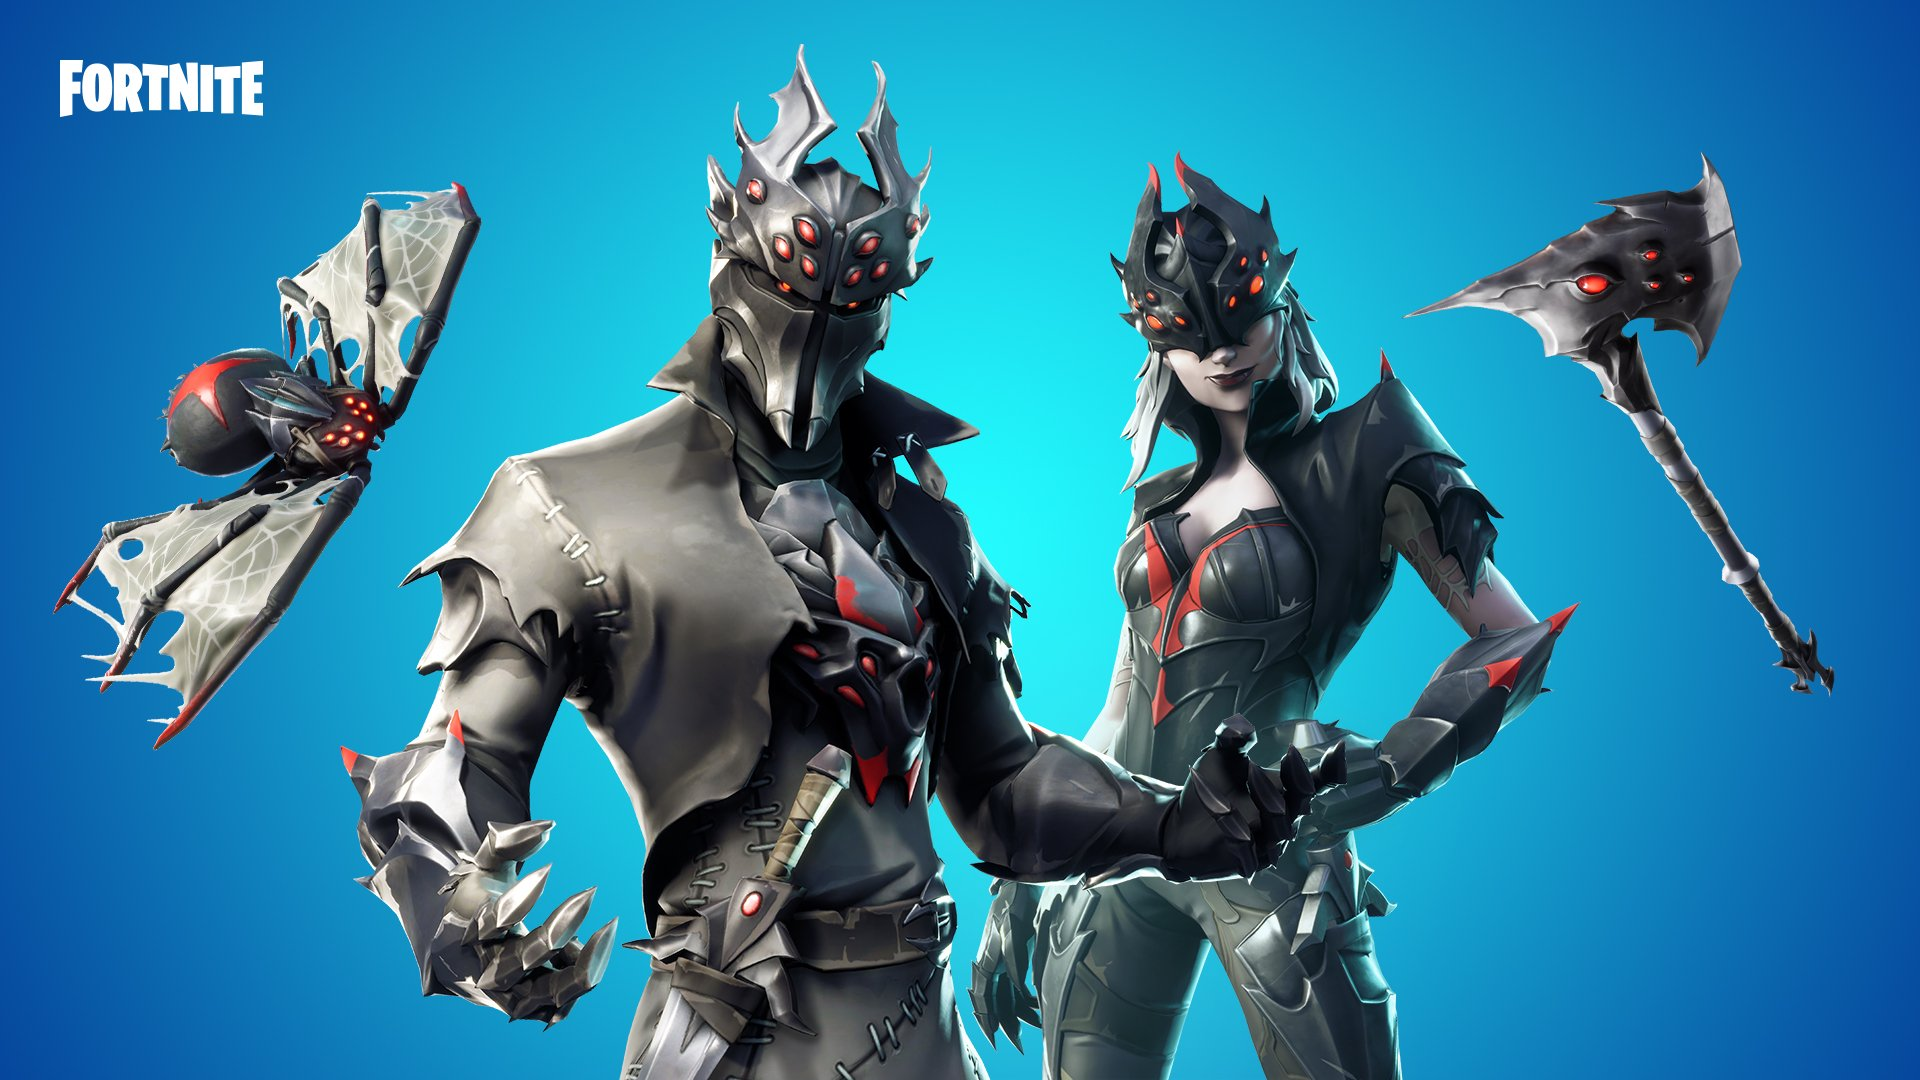 Fortnite Spider Knight Skin Legendary Outfit Fortnite Skins